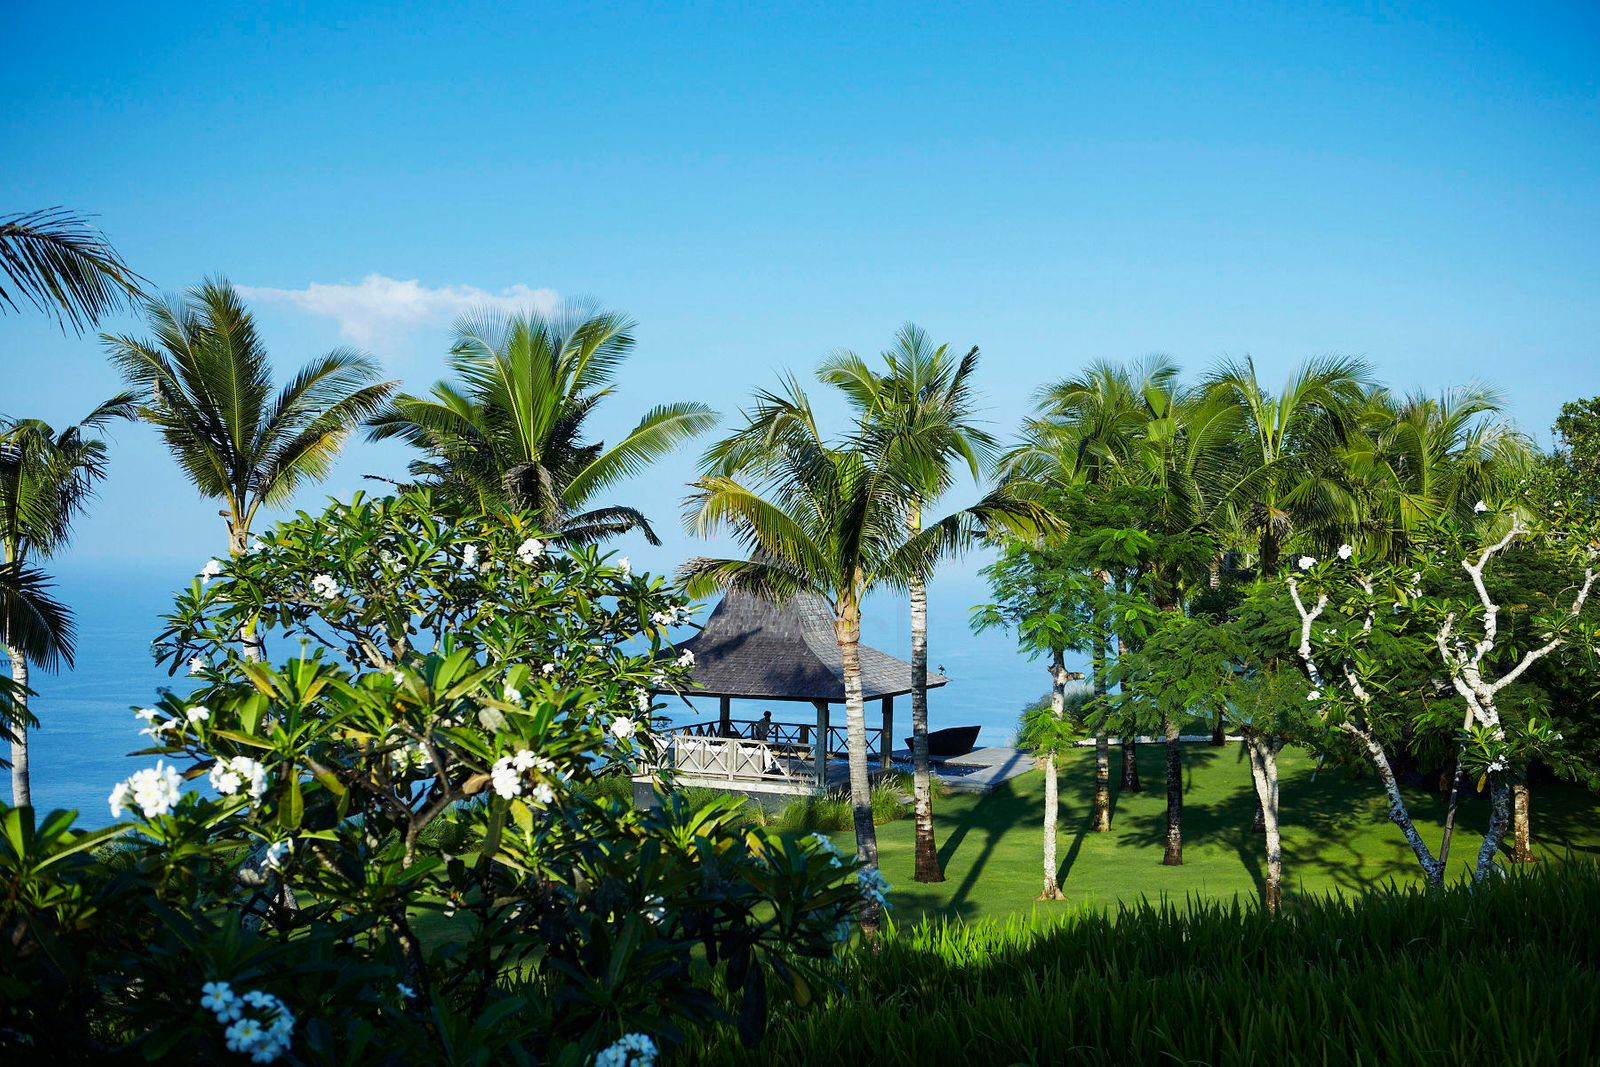 Bali, Indonesia. © John Kernick NO RIGHTS GRANTED